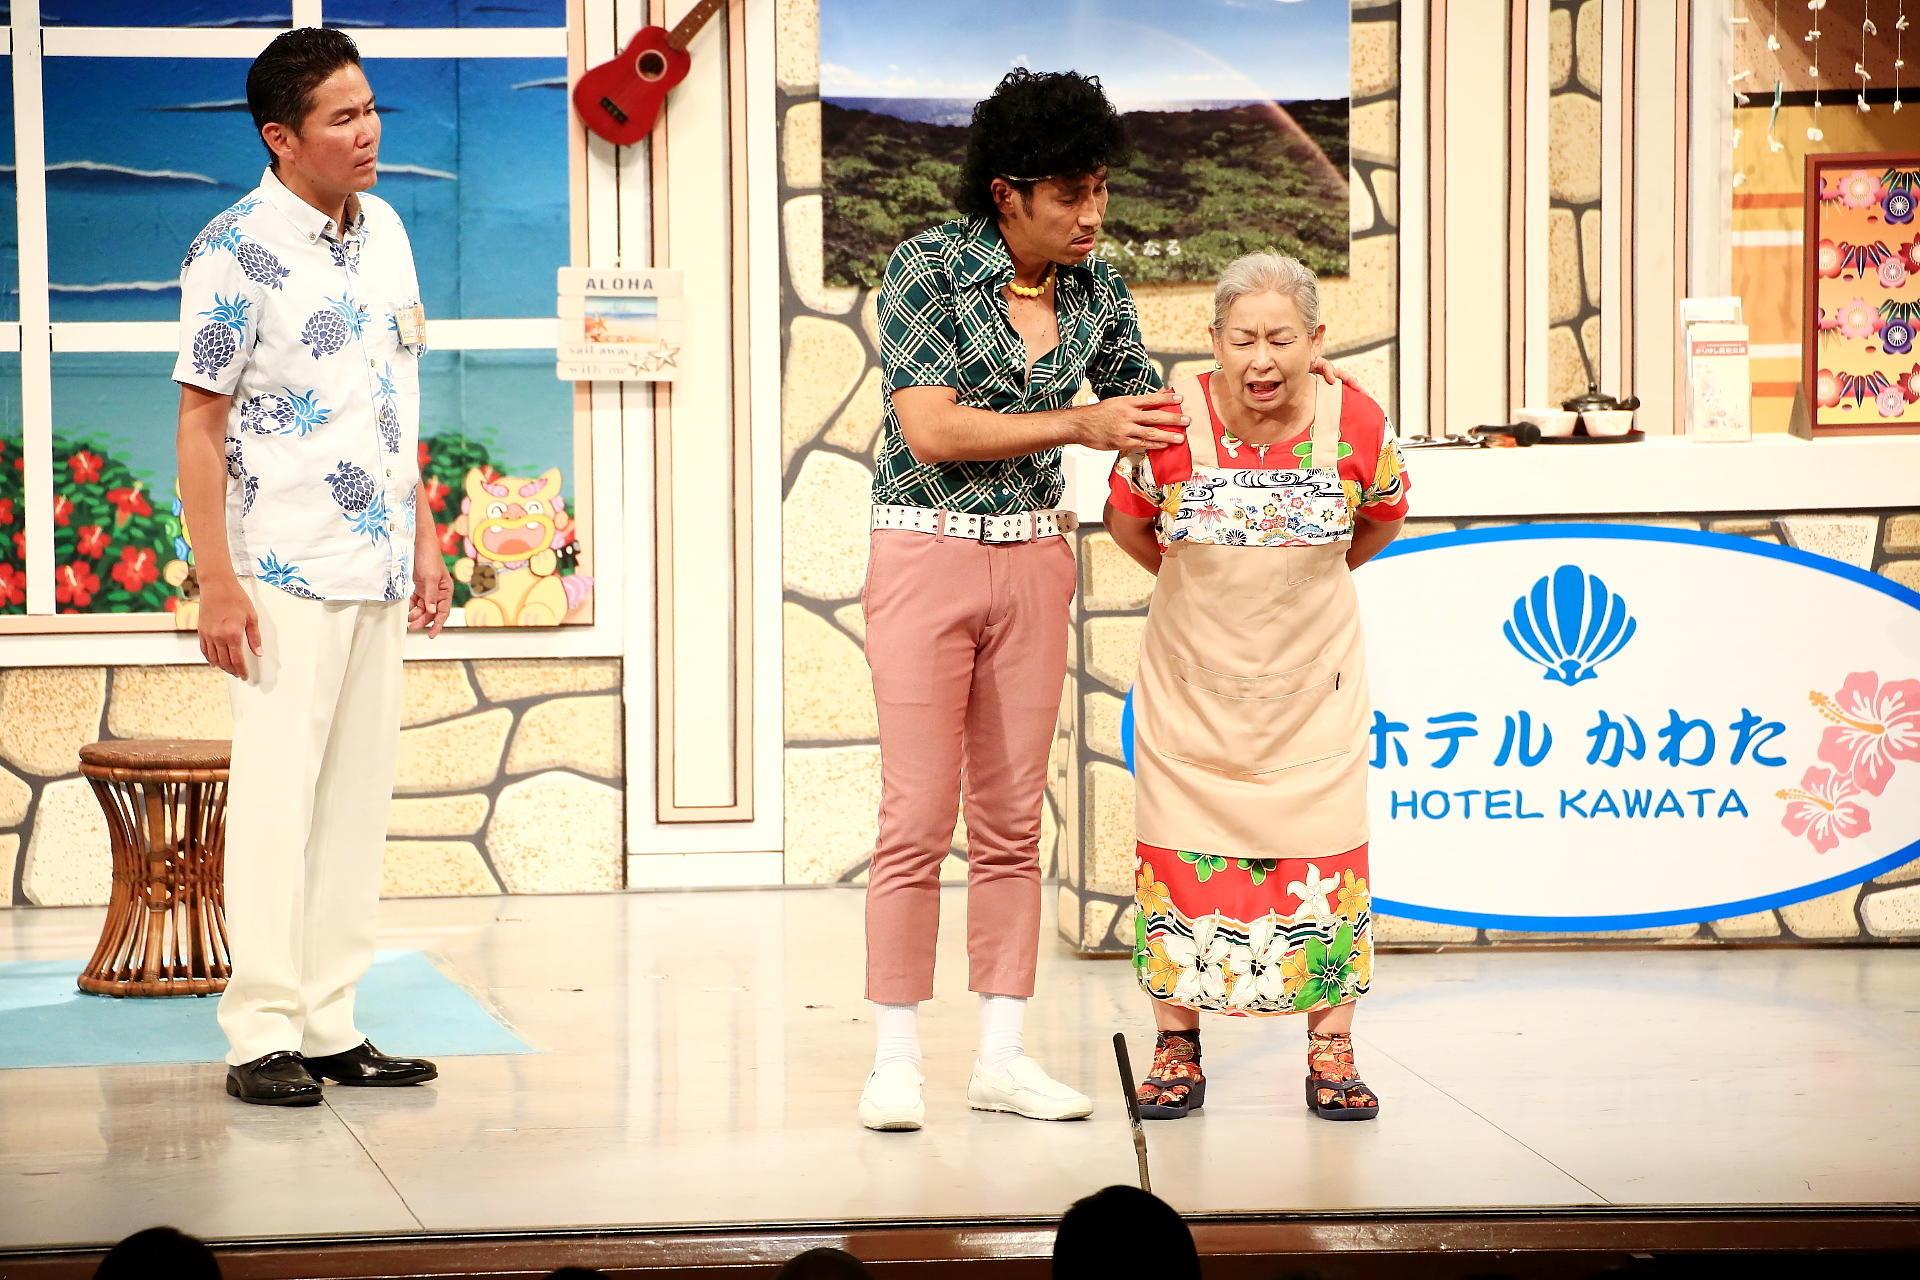 http://news.yoshimoto.co.jp/20180906110005-be7339cc10acb5c8f4a5028d95a520c81a6f3174.jpg